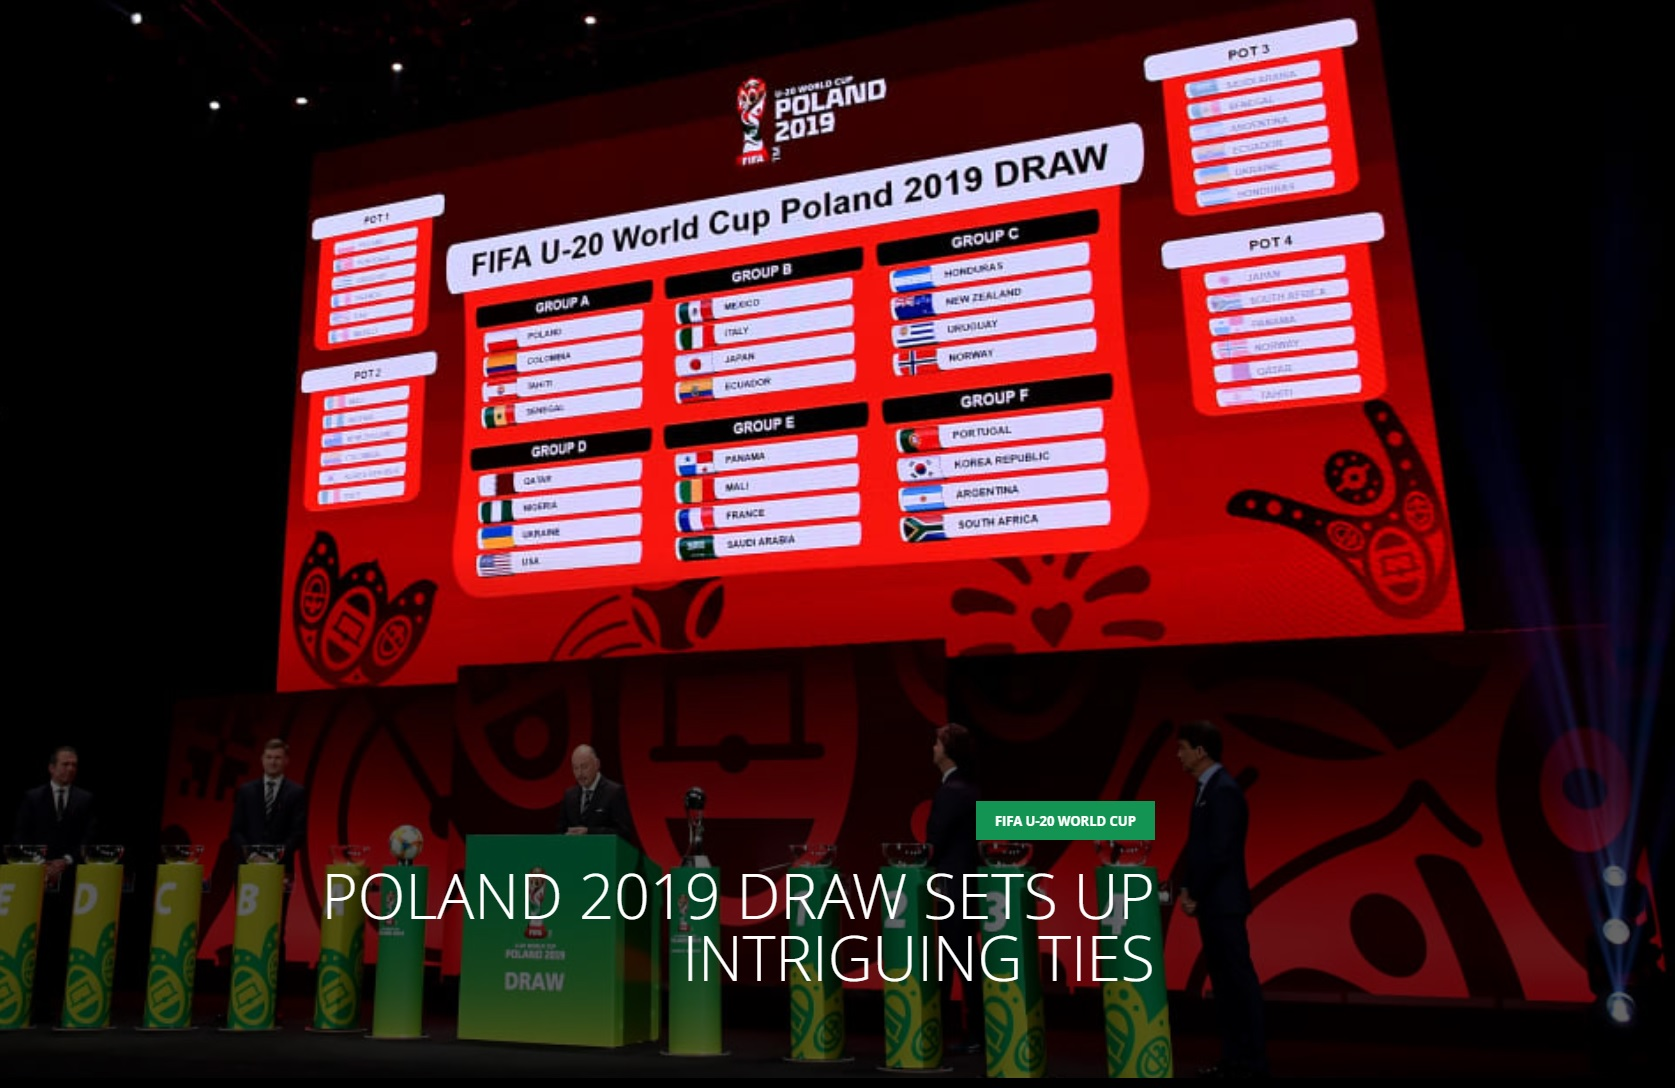 2019 FIFA U-20ワールドカップ 結果速報・日程選手・組み合わせ